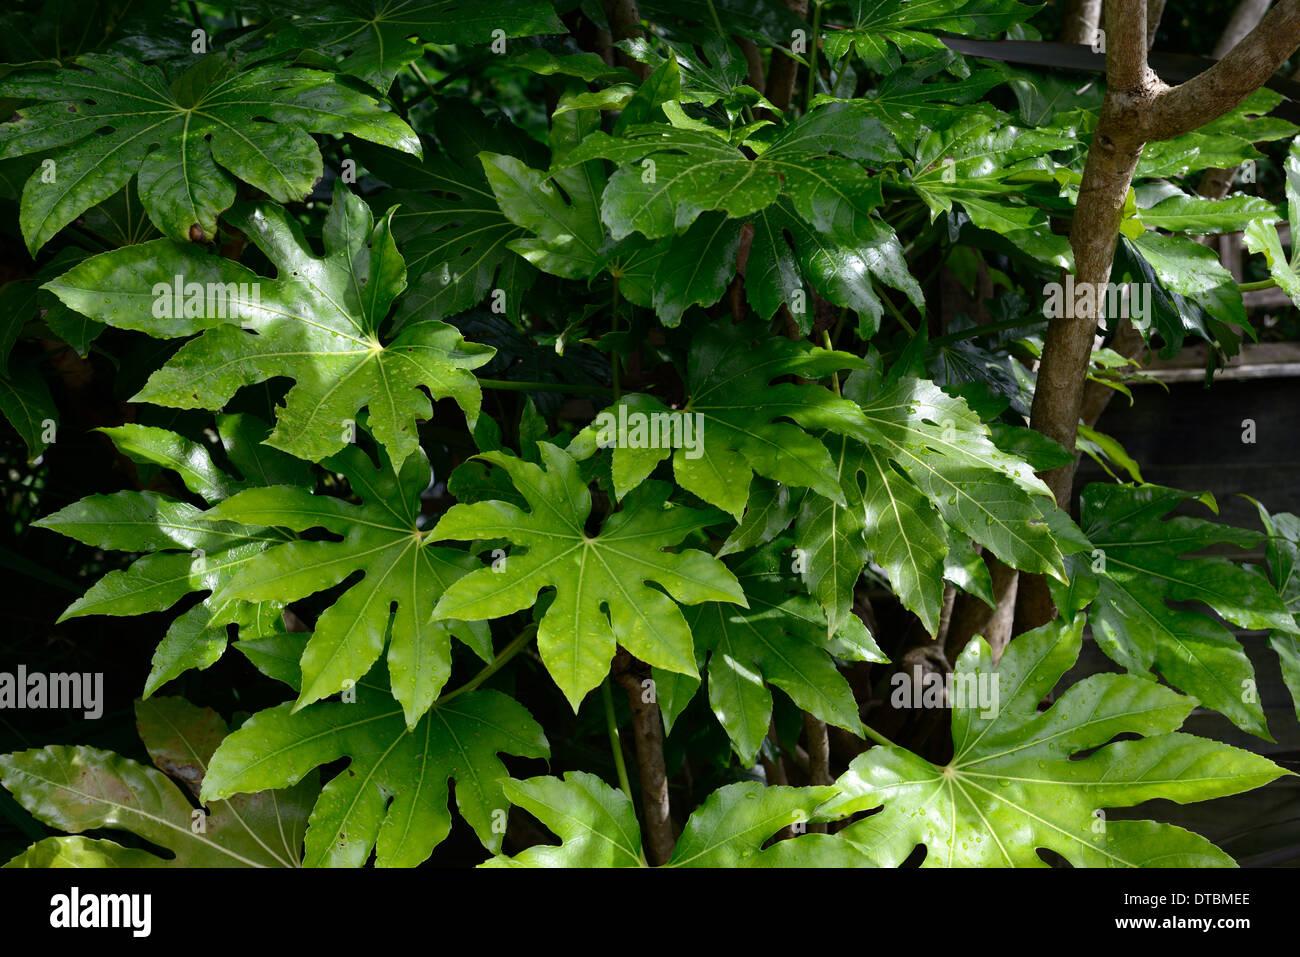 fatsia japonica green foliage leaves plant portraits evergreen shrubs